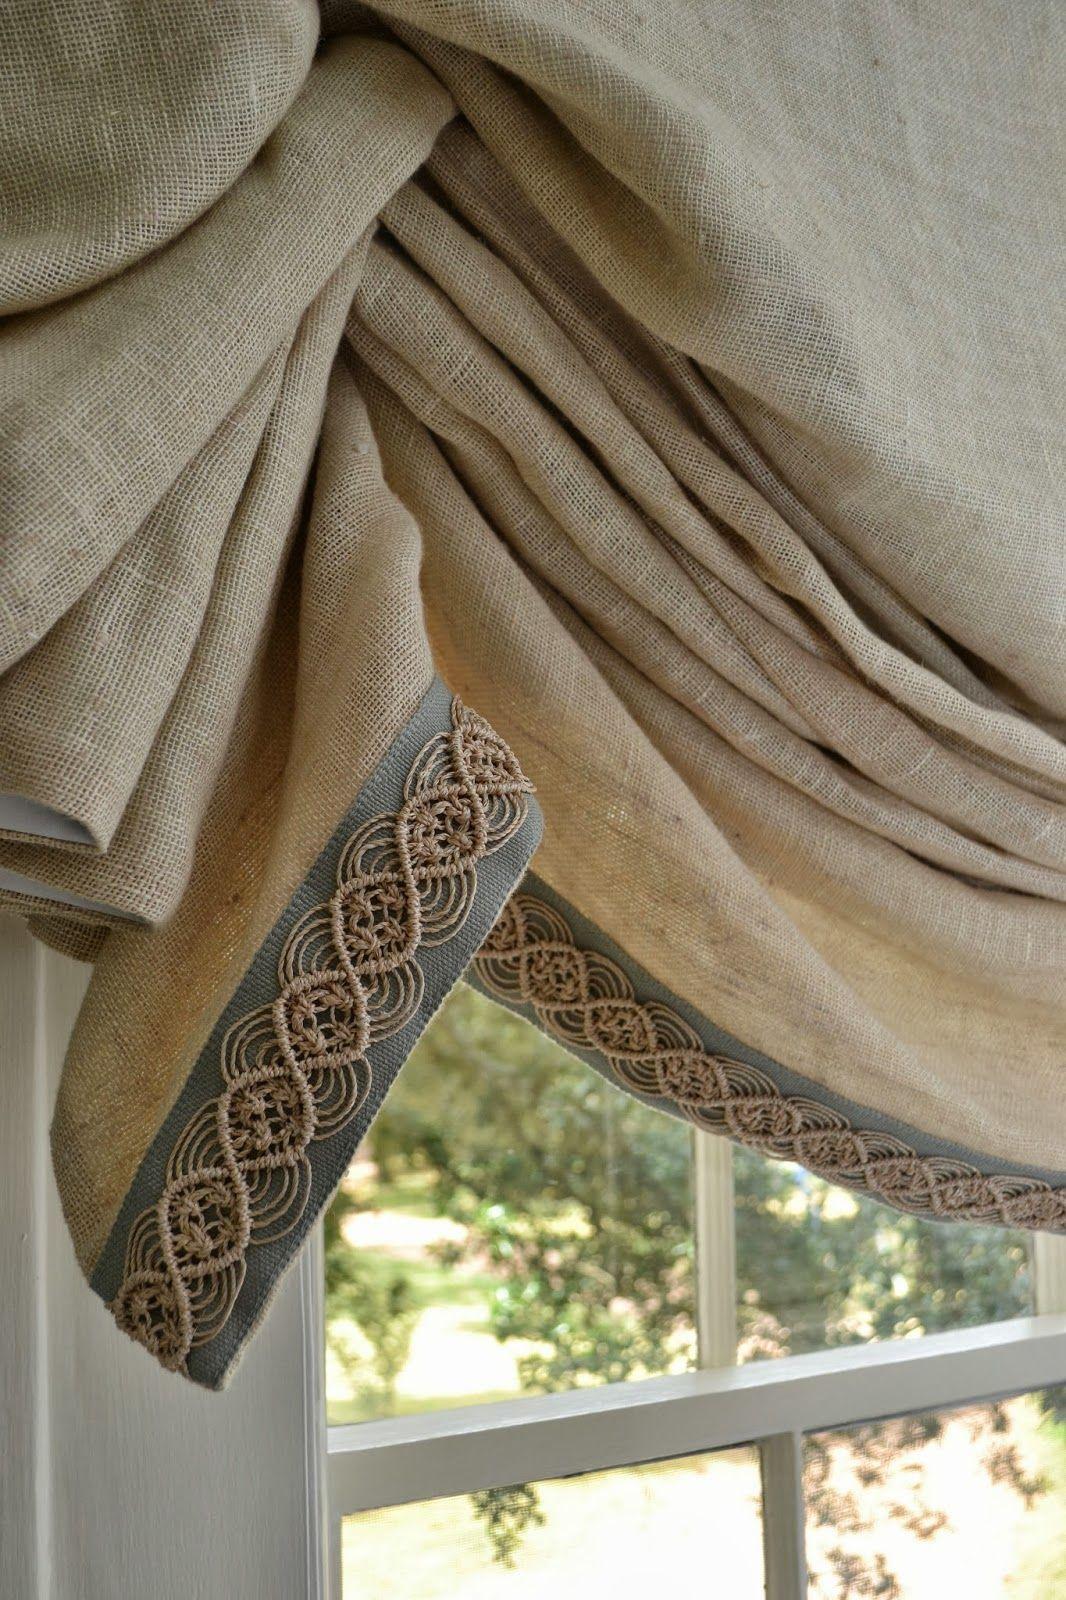 window treatment trim ... makes the natural linen fabric elegant